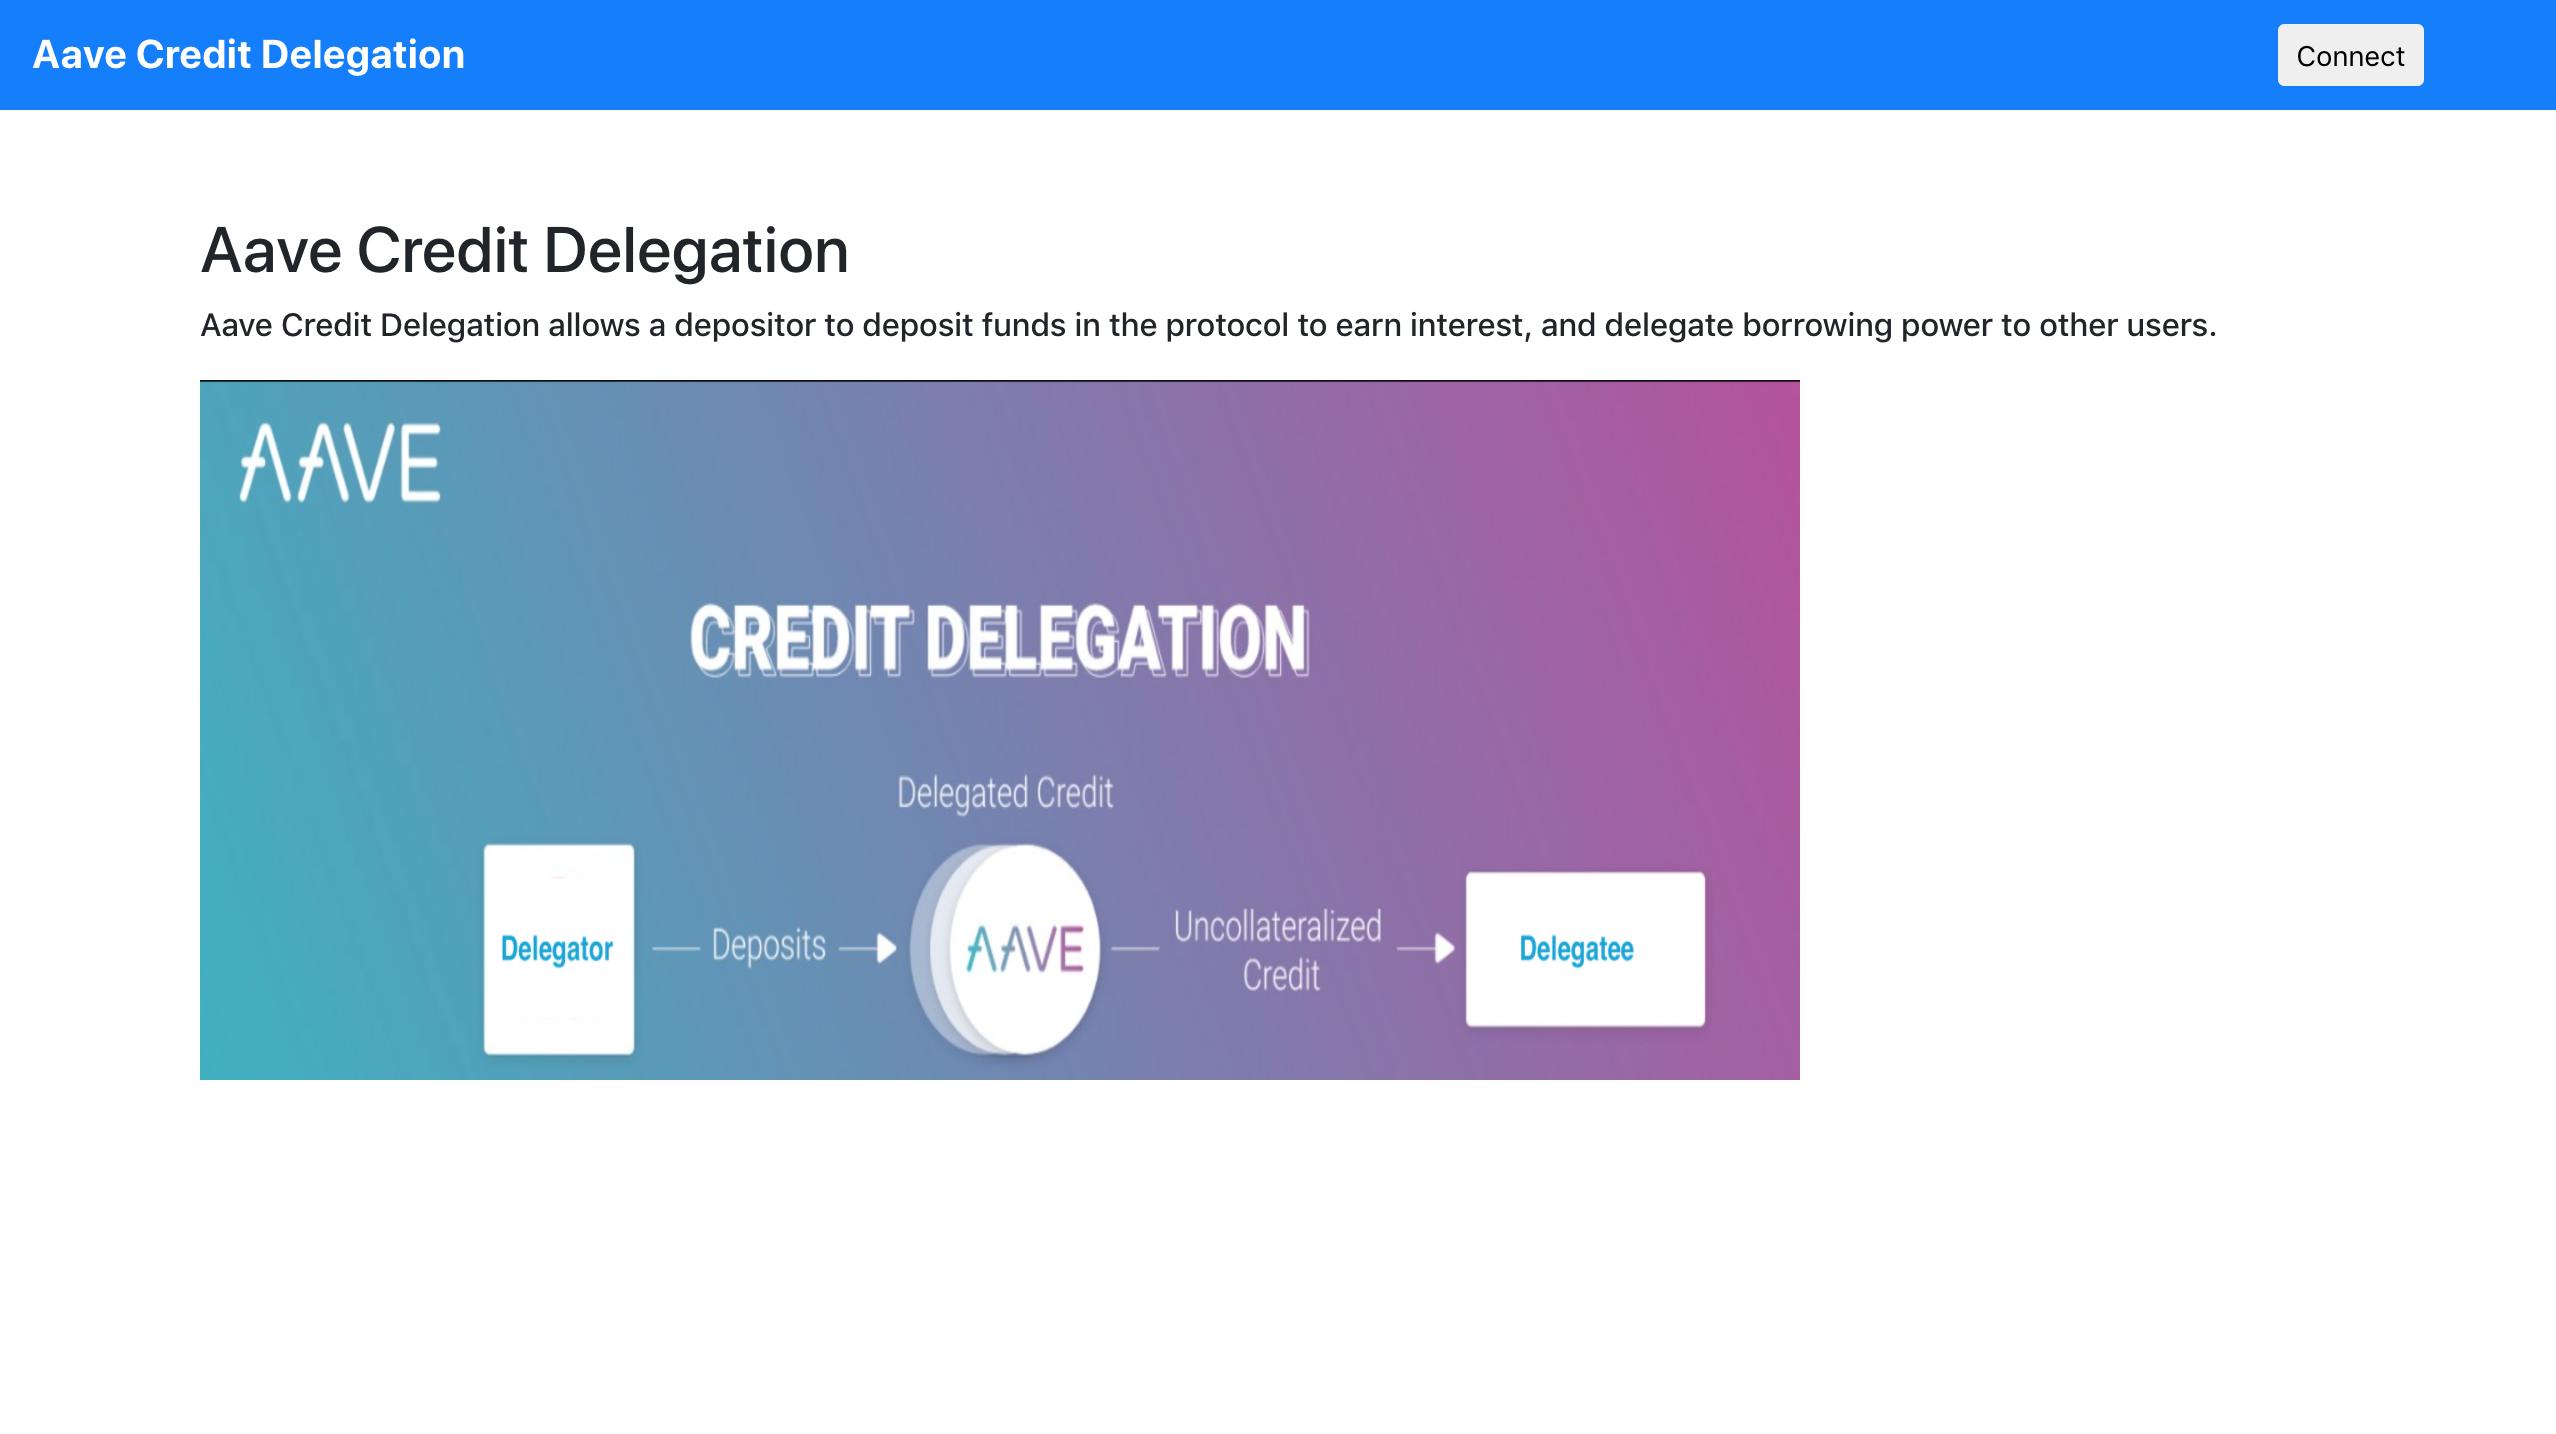 https://ethglobal.s3.amazonaws.com/recxagBGKnBBoaQaf/aave_credit_delegation_1.png